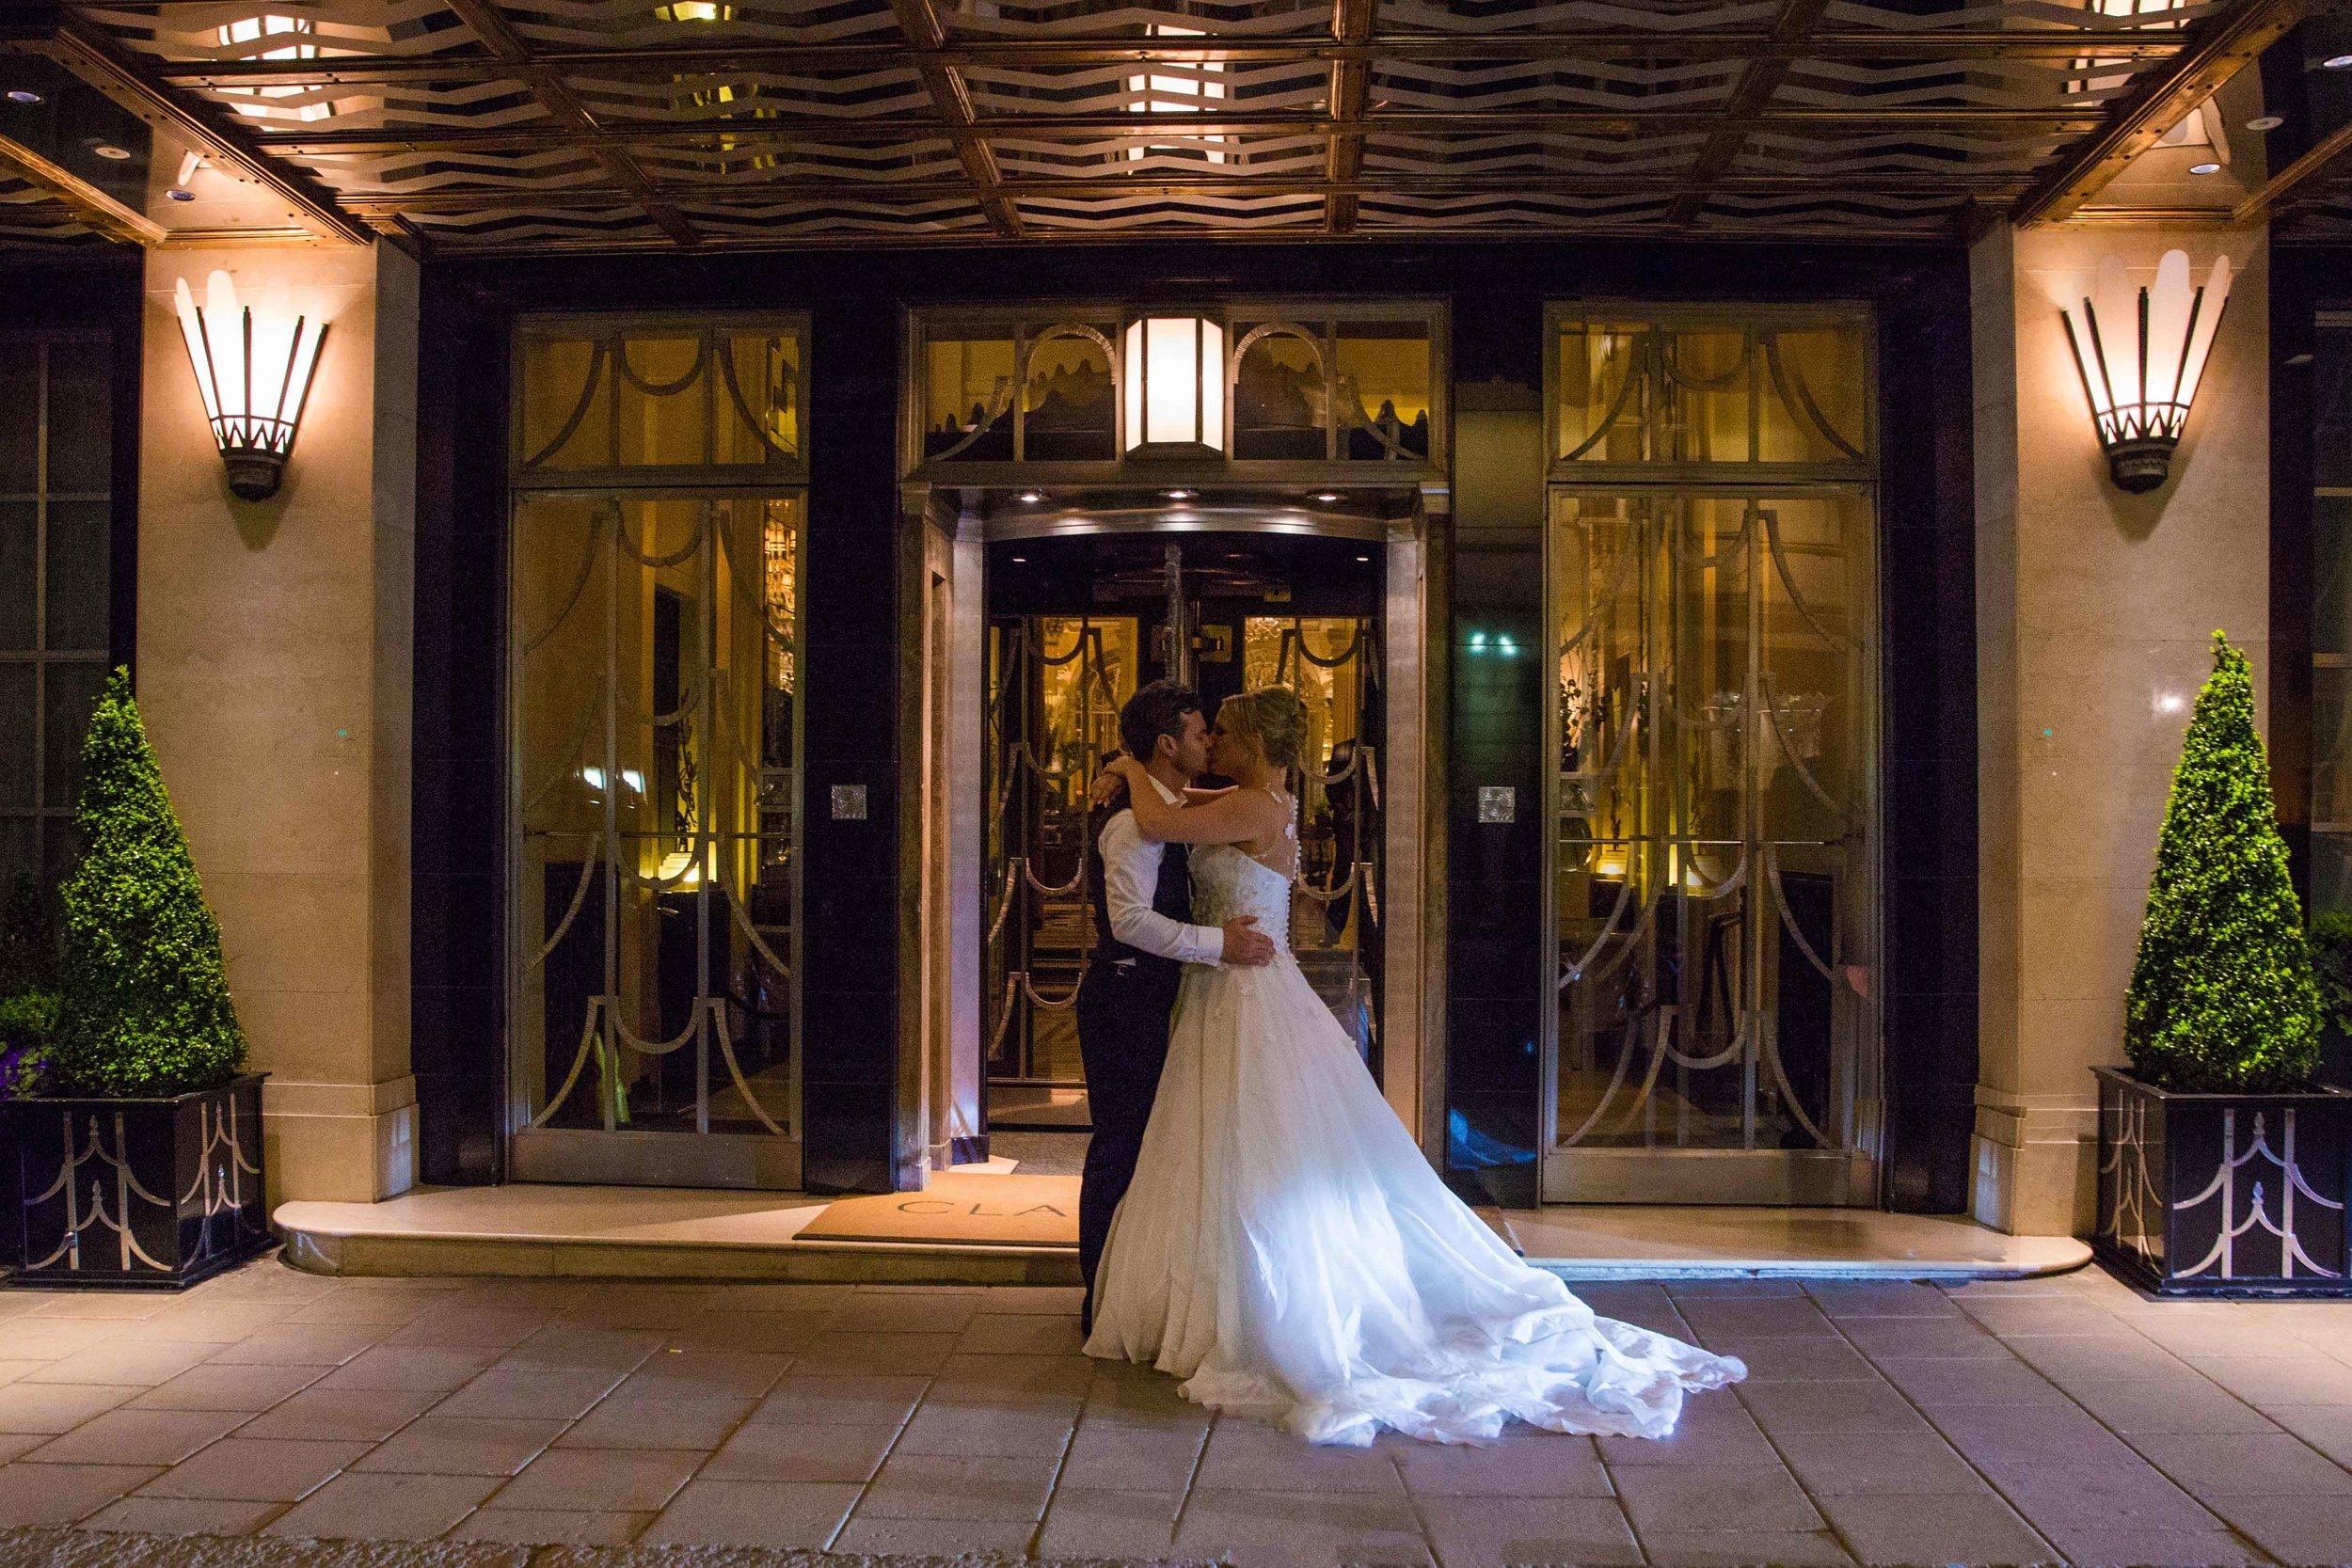 Wedding at Claridge's - Mayfair, London